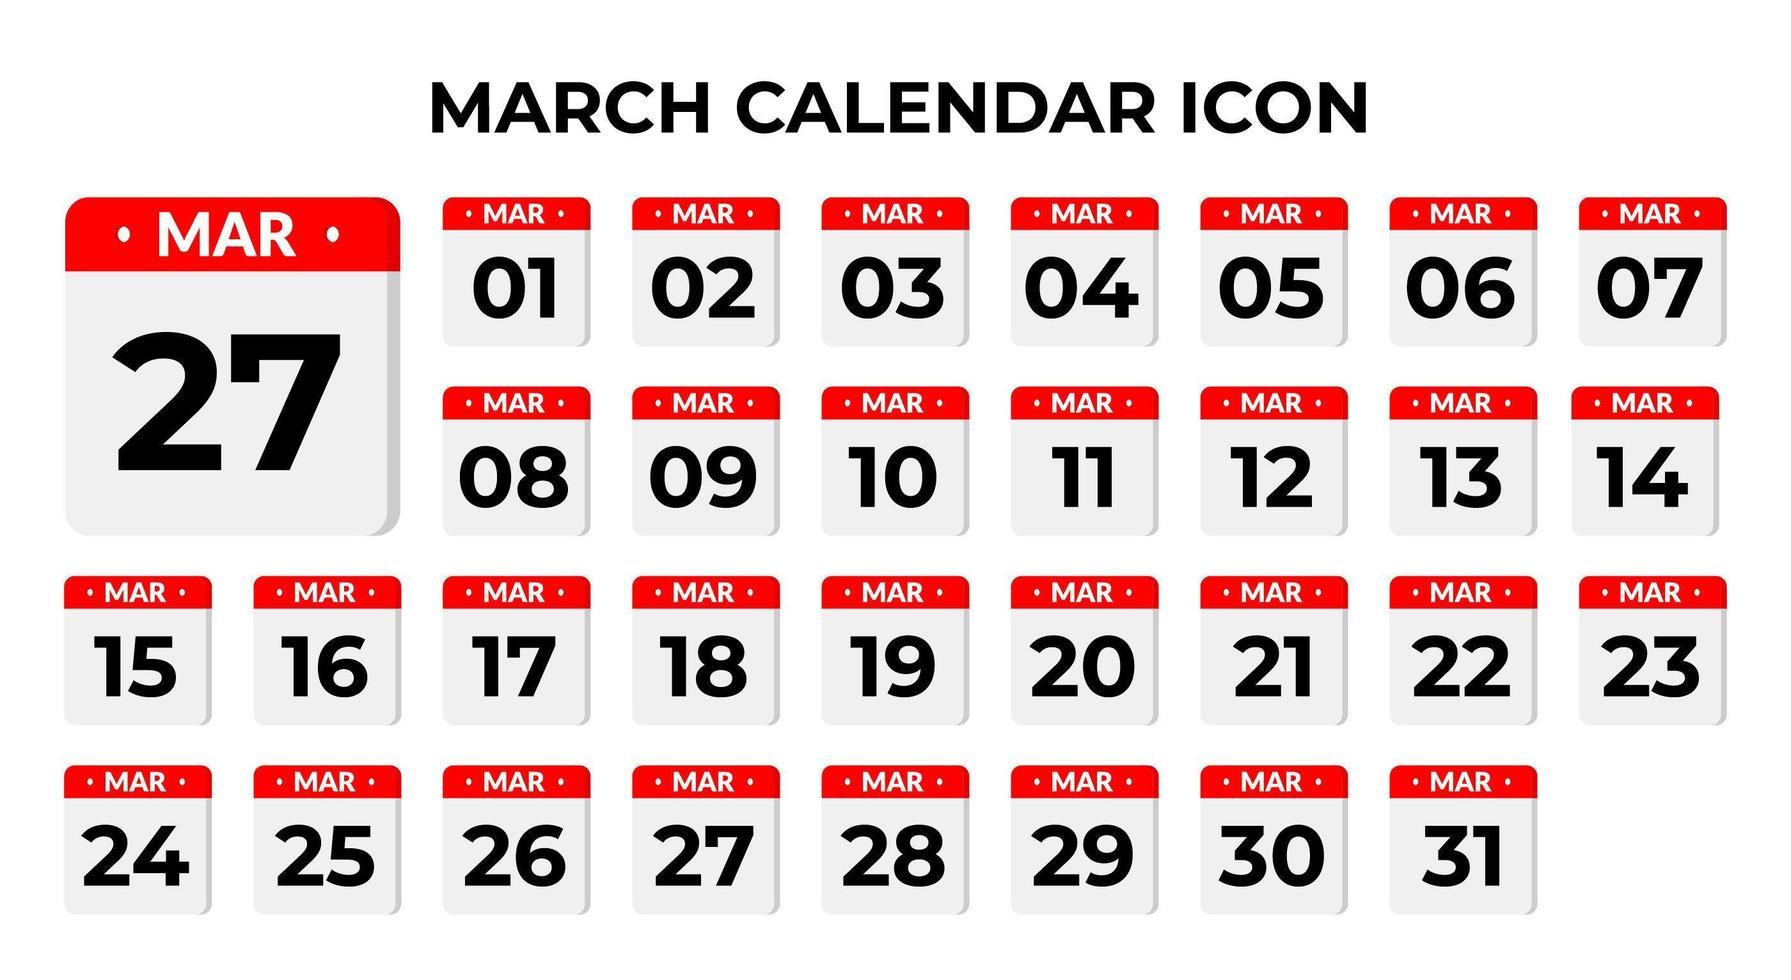 iconos de calendario de marzo vector